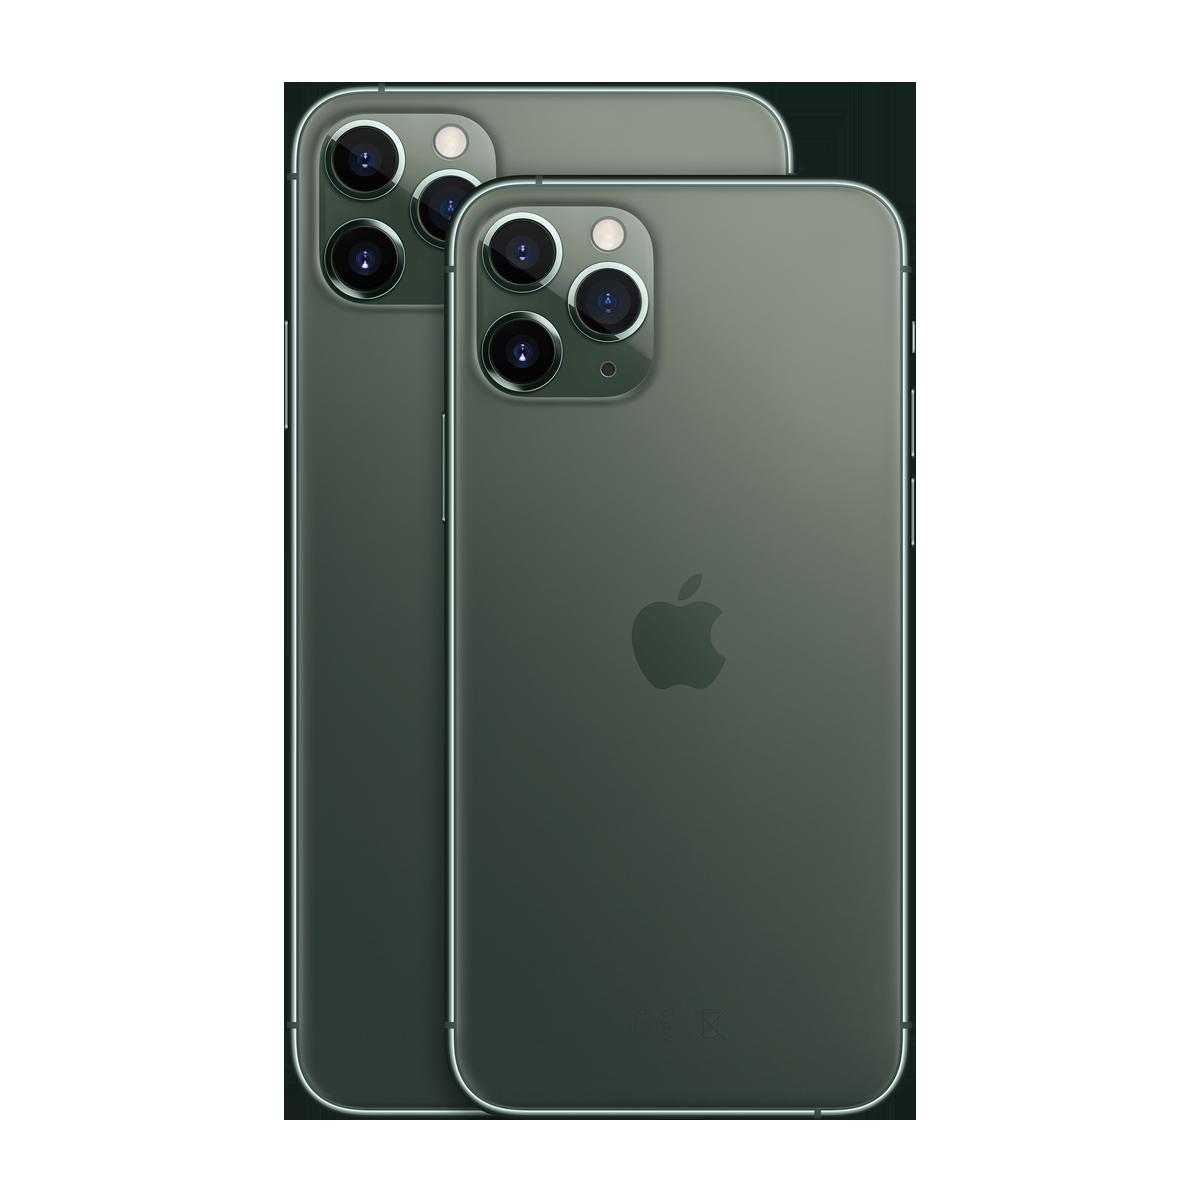 Apple iPhone 11 Pro Max 256 GB Yeşil